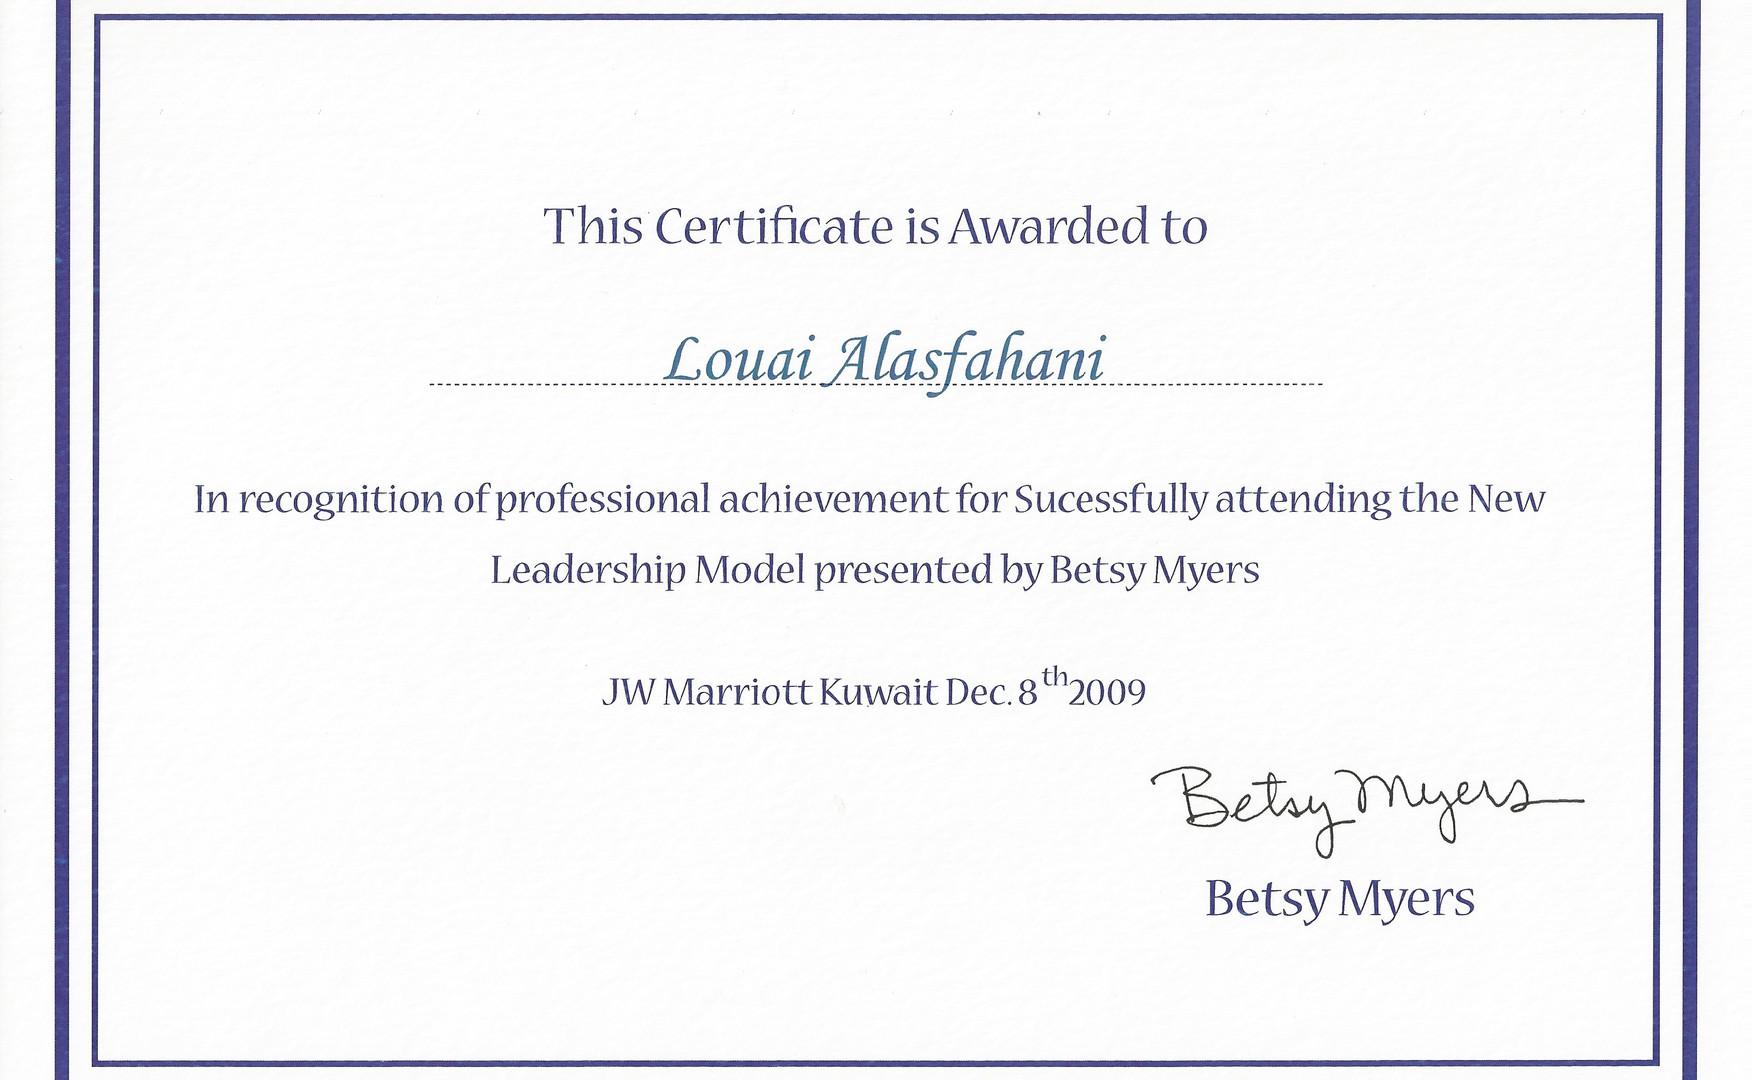 Attendance Certificate-Betsy Myers.jpeg